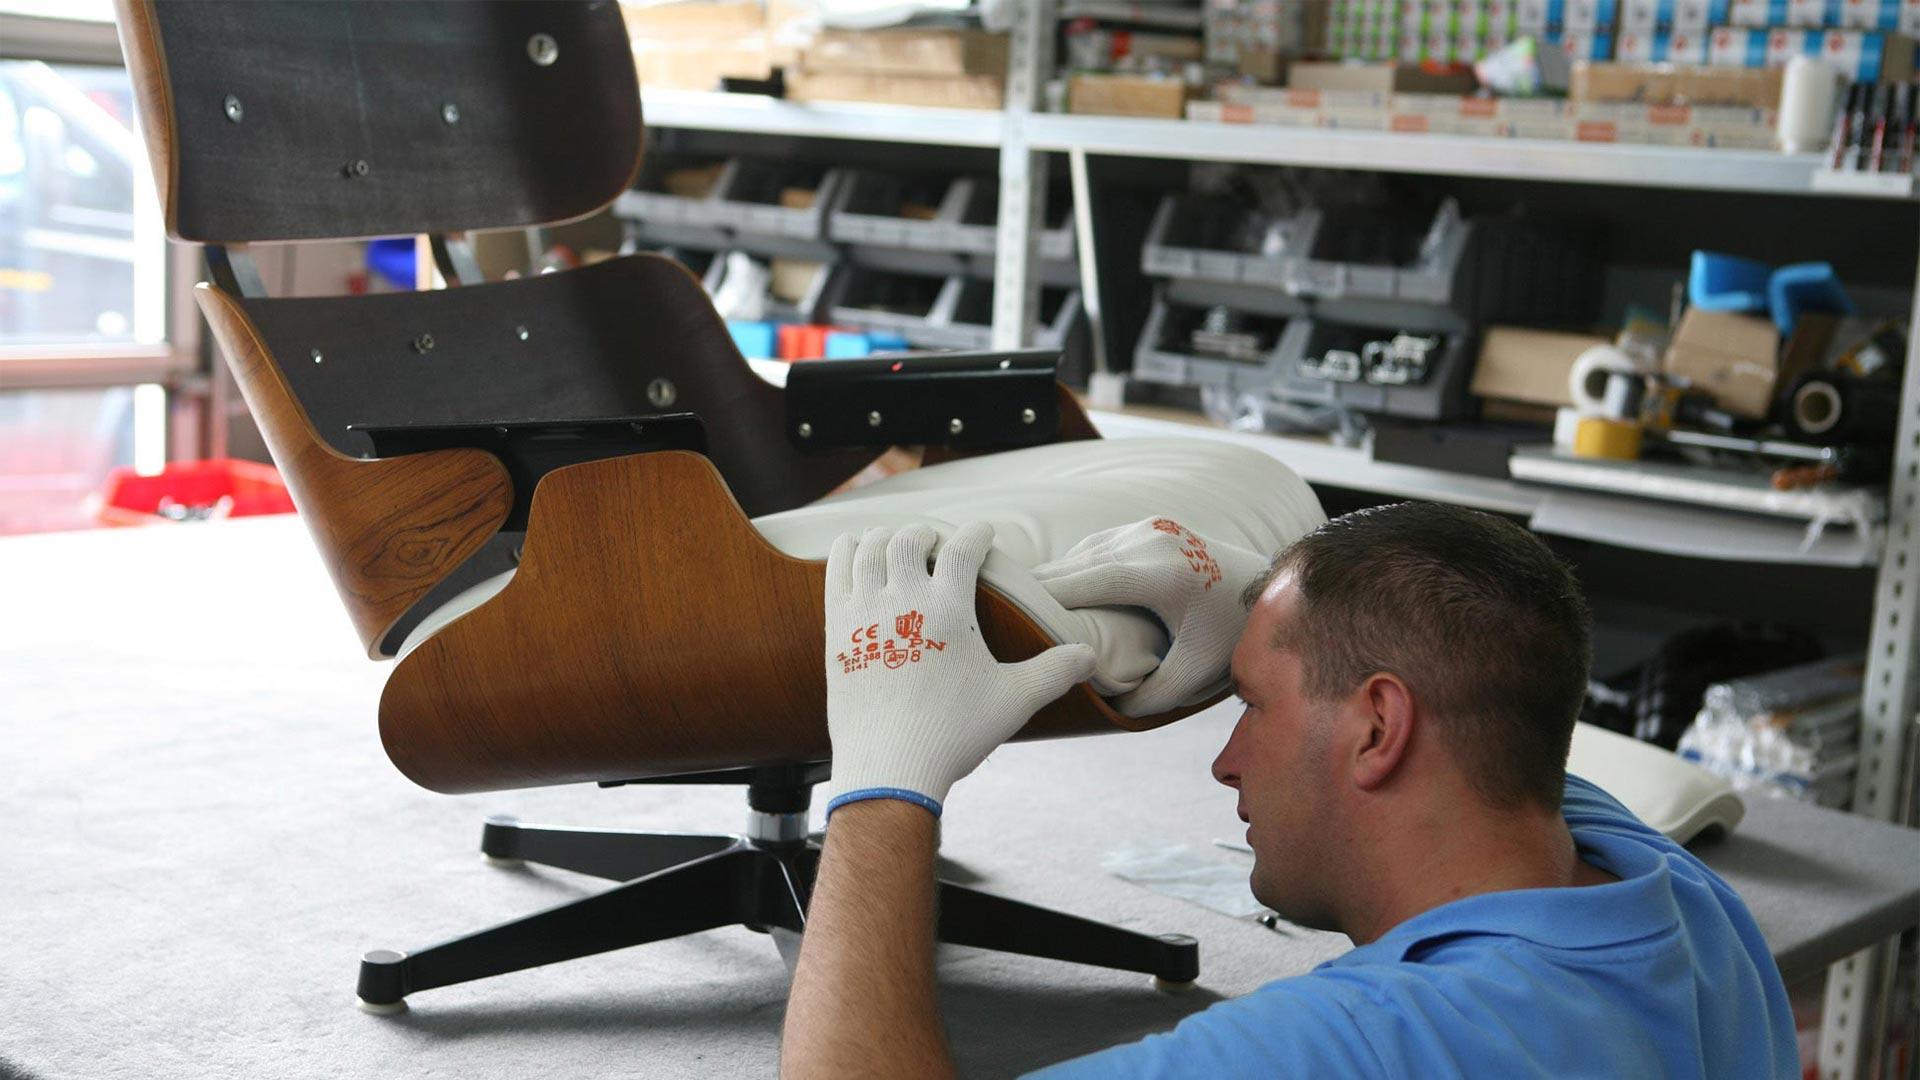 Reparatur Vitra Eames Lounge Chair Ersatzteile in Berlin bei steiden+02